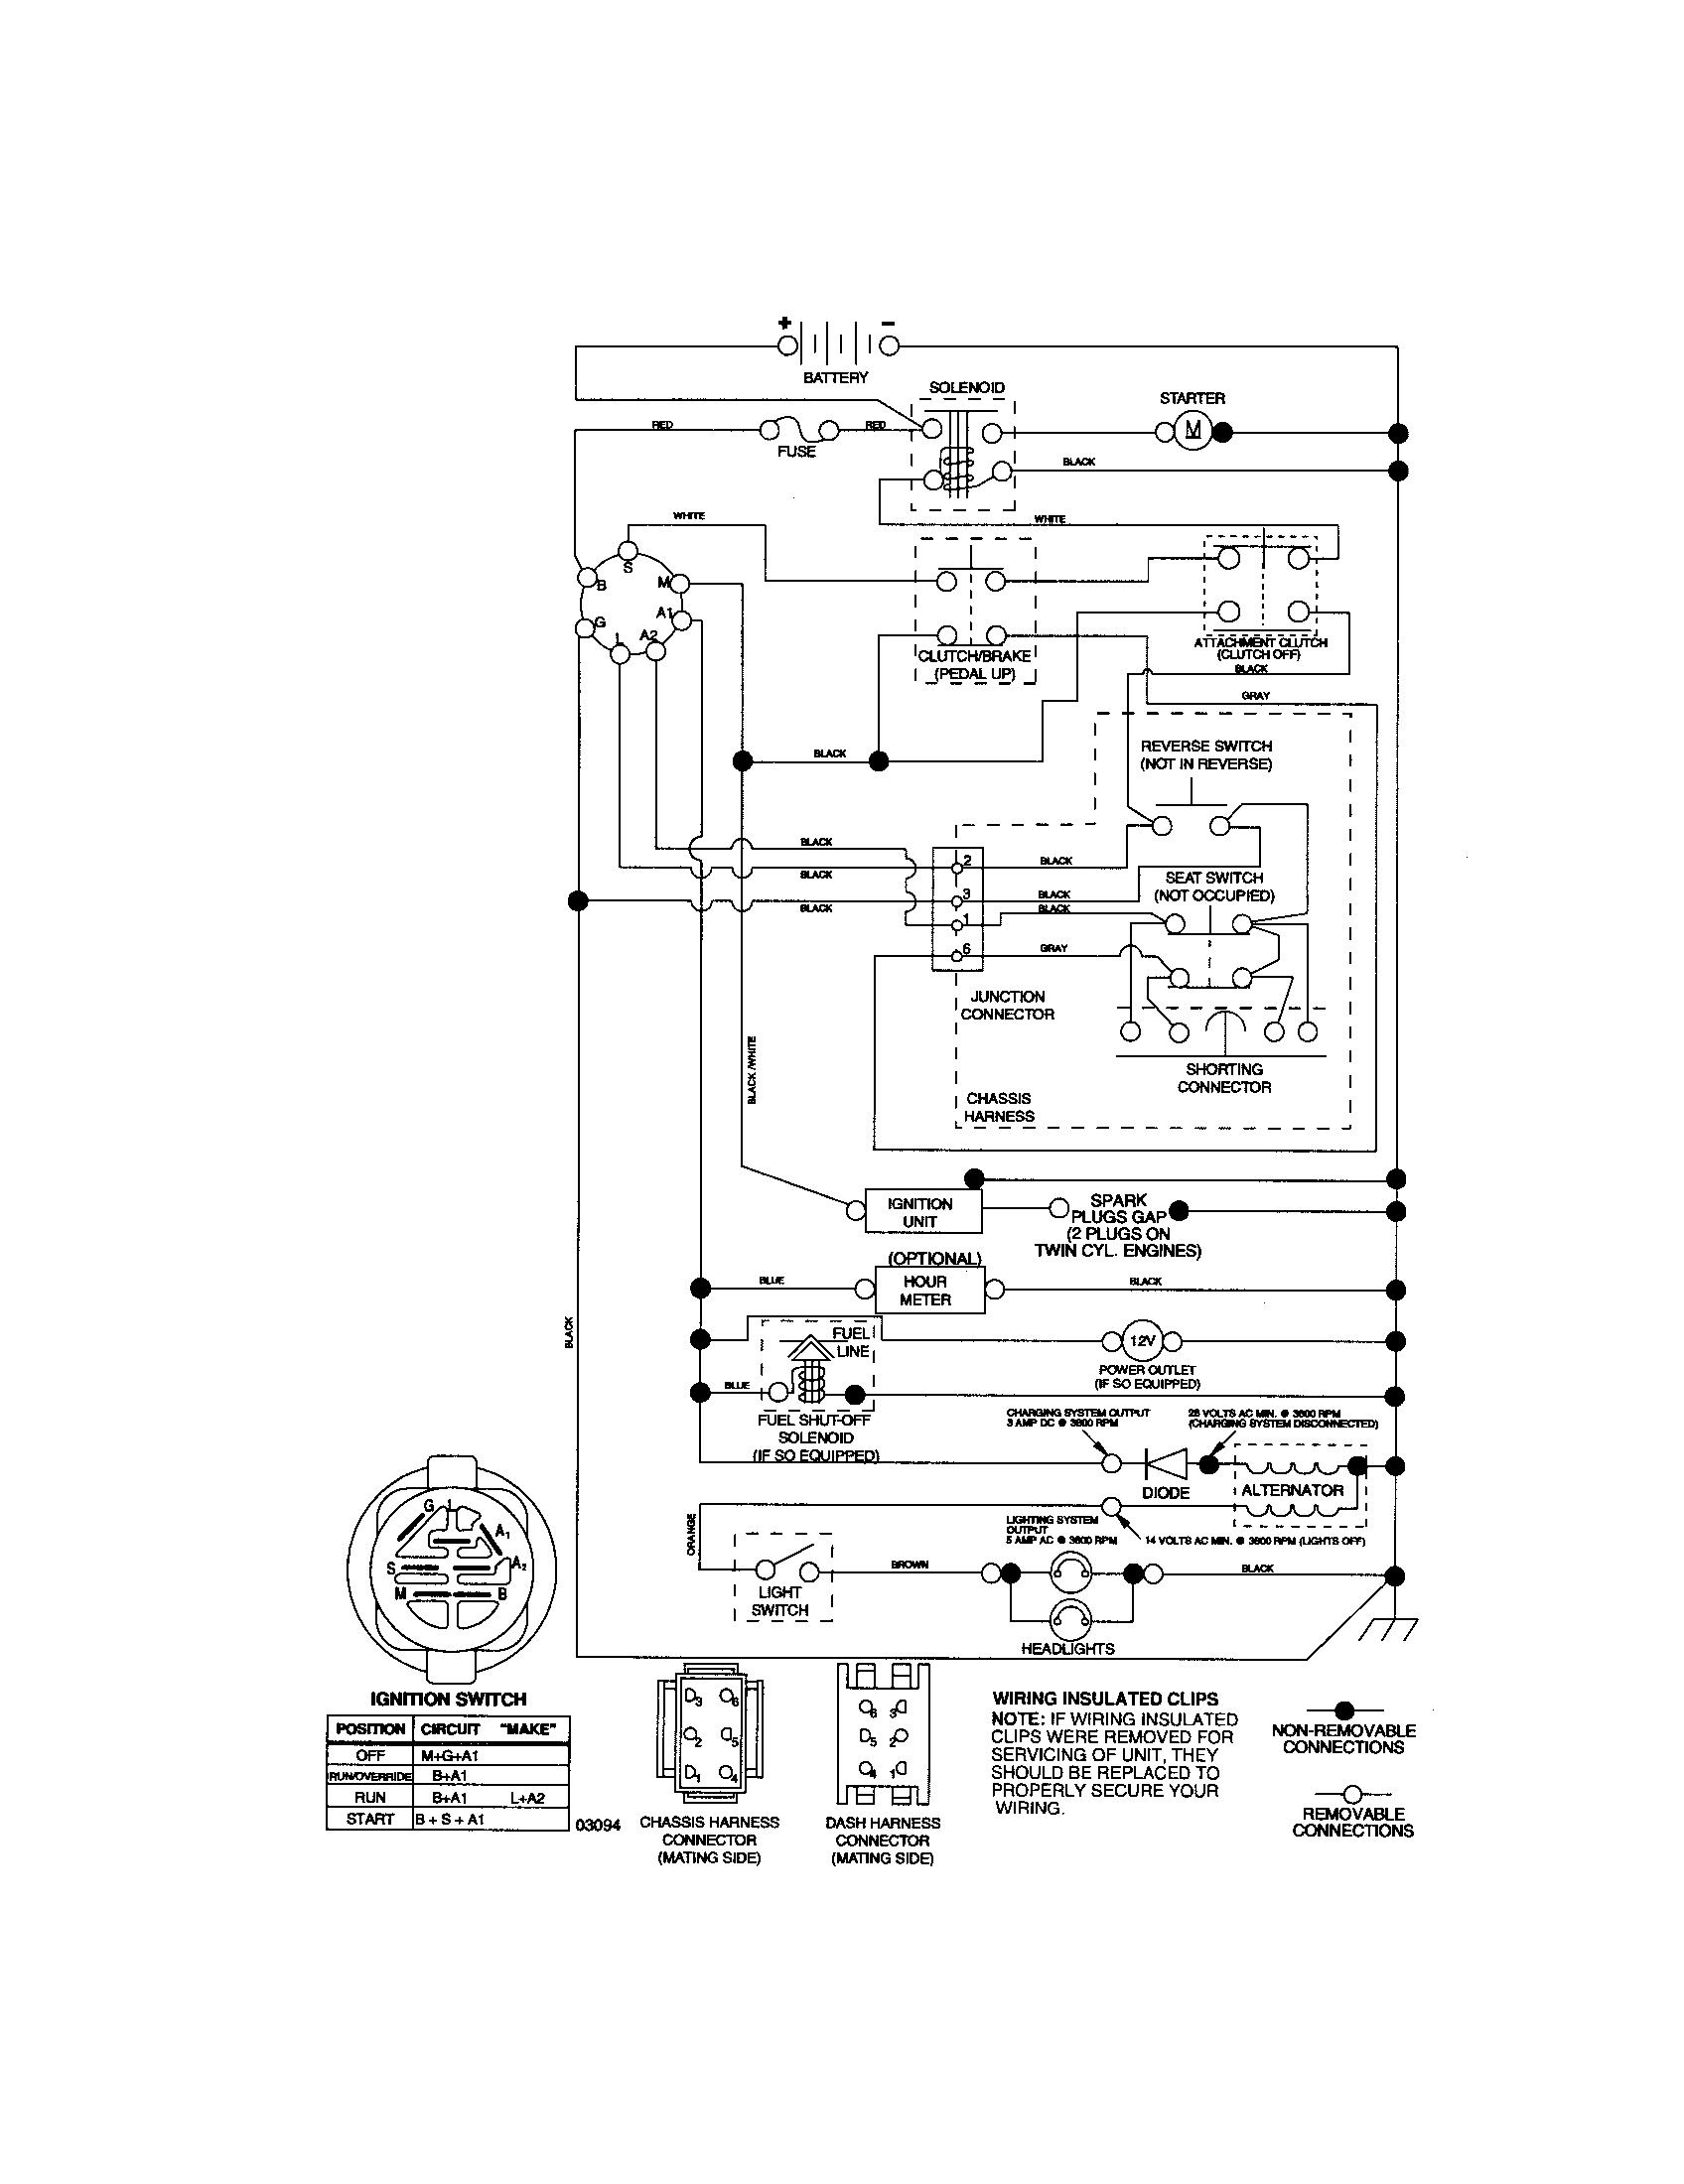 Wiring Diagram Craftsman Garden Tractor 917 273761 | Manual E-Books - Craftsman Lawn Mower Model 917 Wiring Diagram